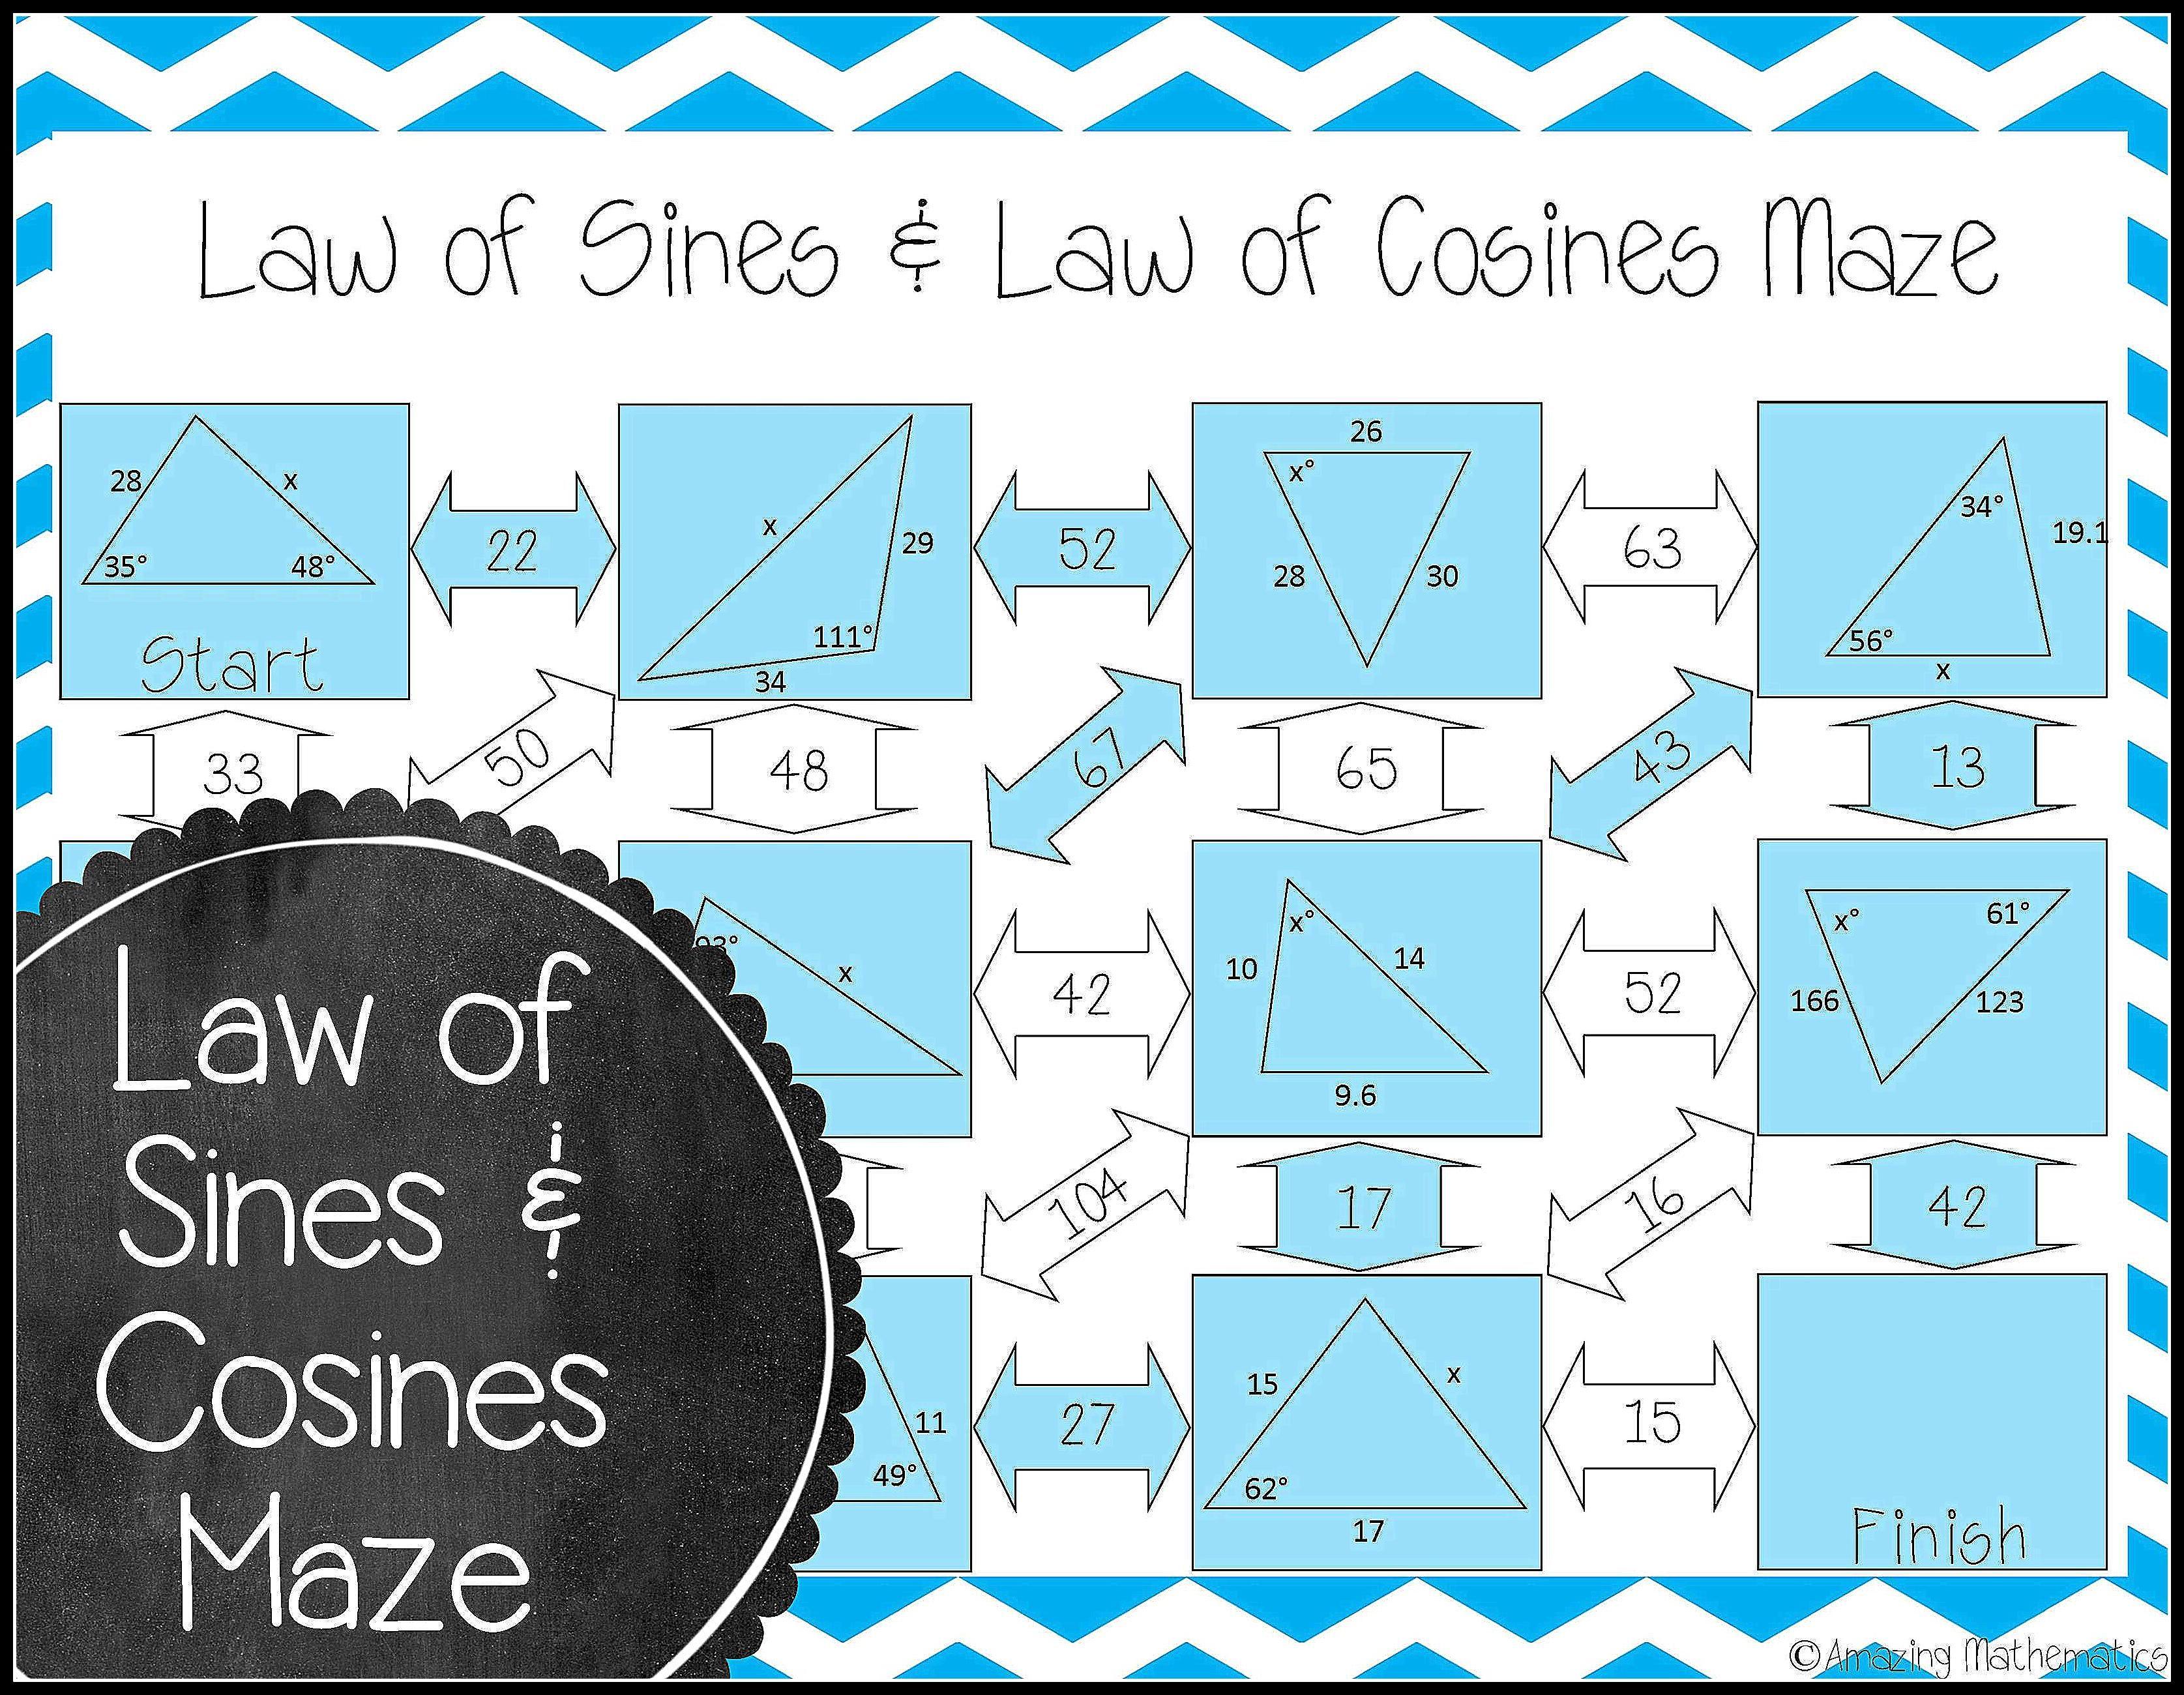 worksheet Law Of Sines And Cosines Worksheet With Answers law of sines and cosines maze students activities maze